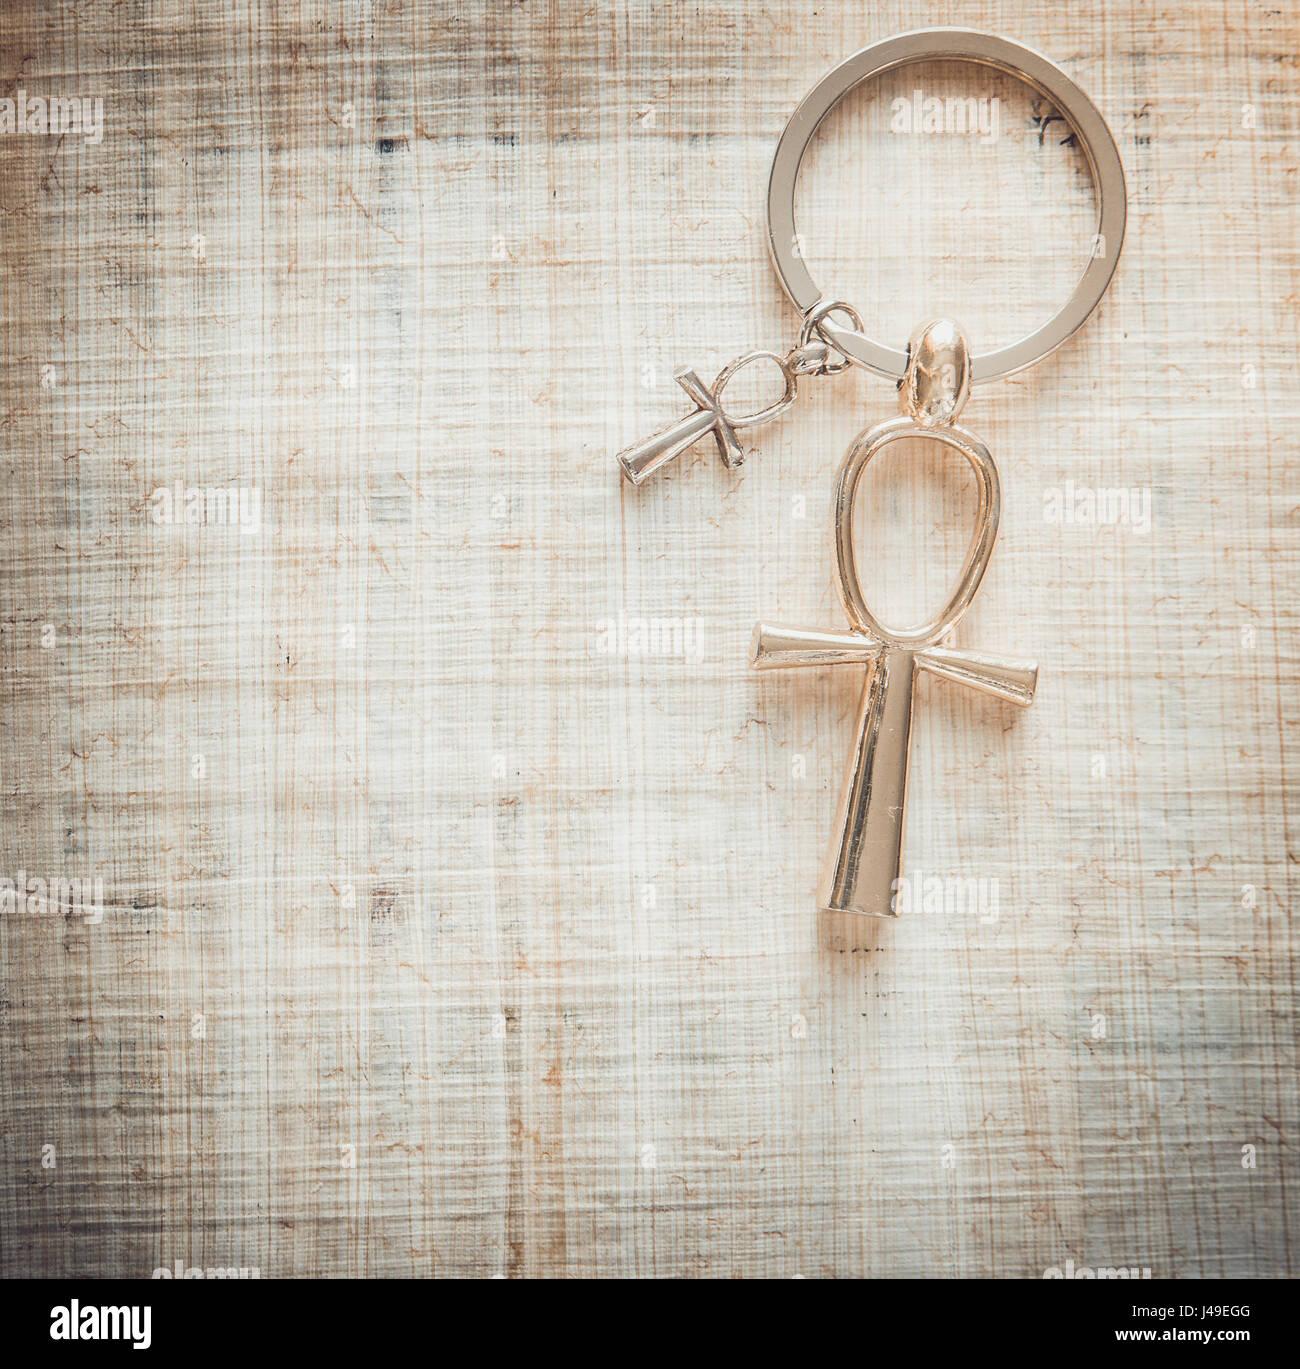 Egyptian Cross Ankh Stock Photo: 140350576 - Alamy